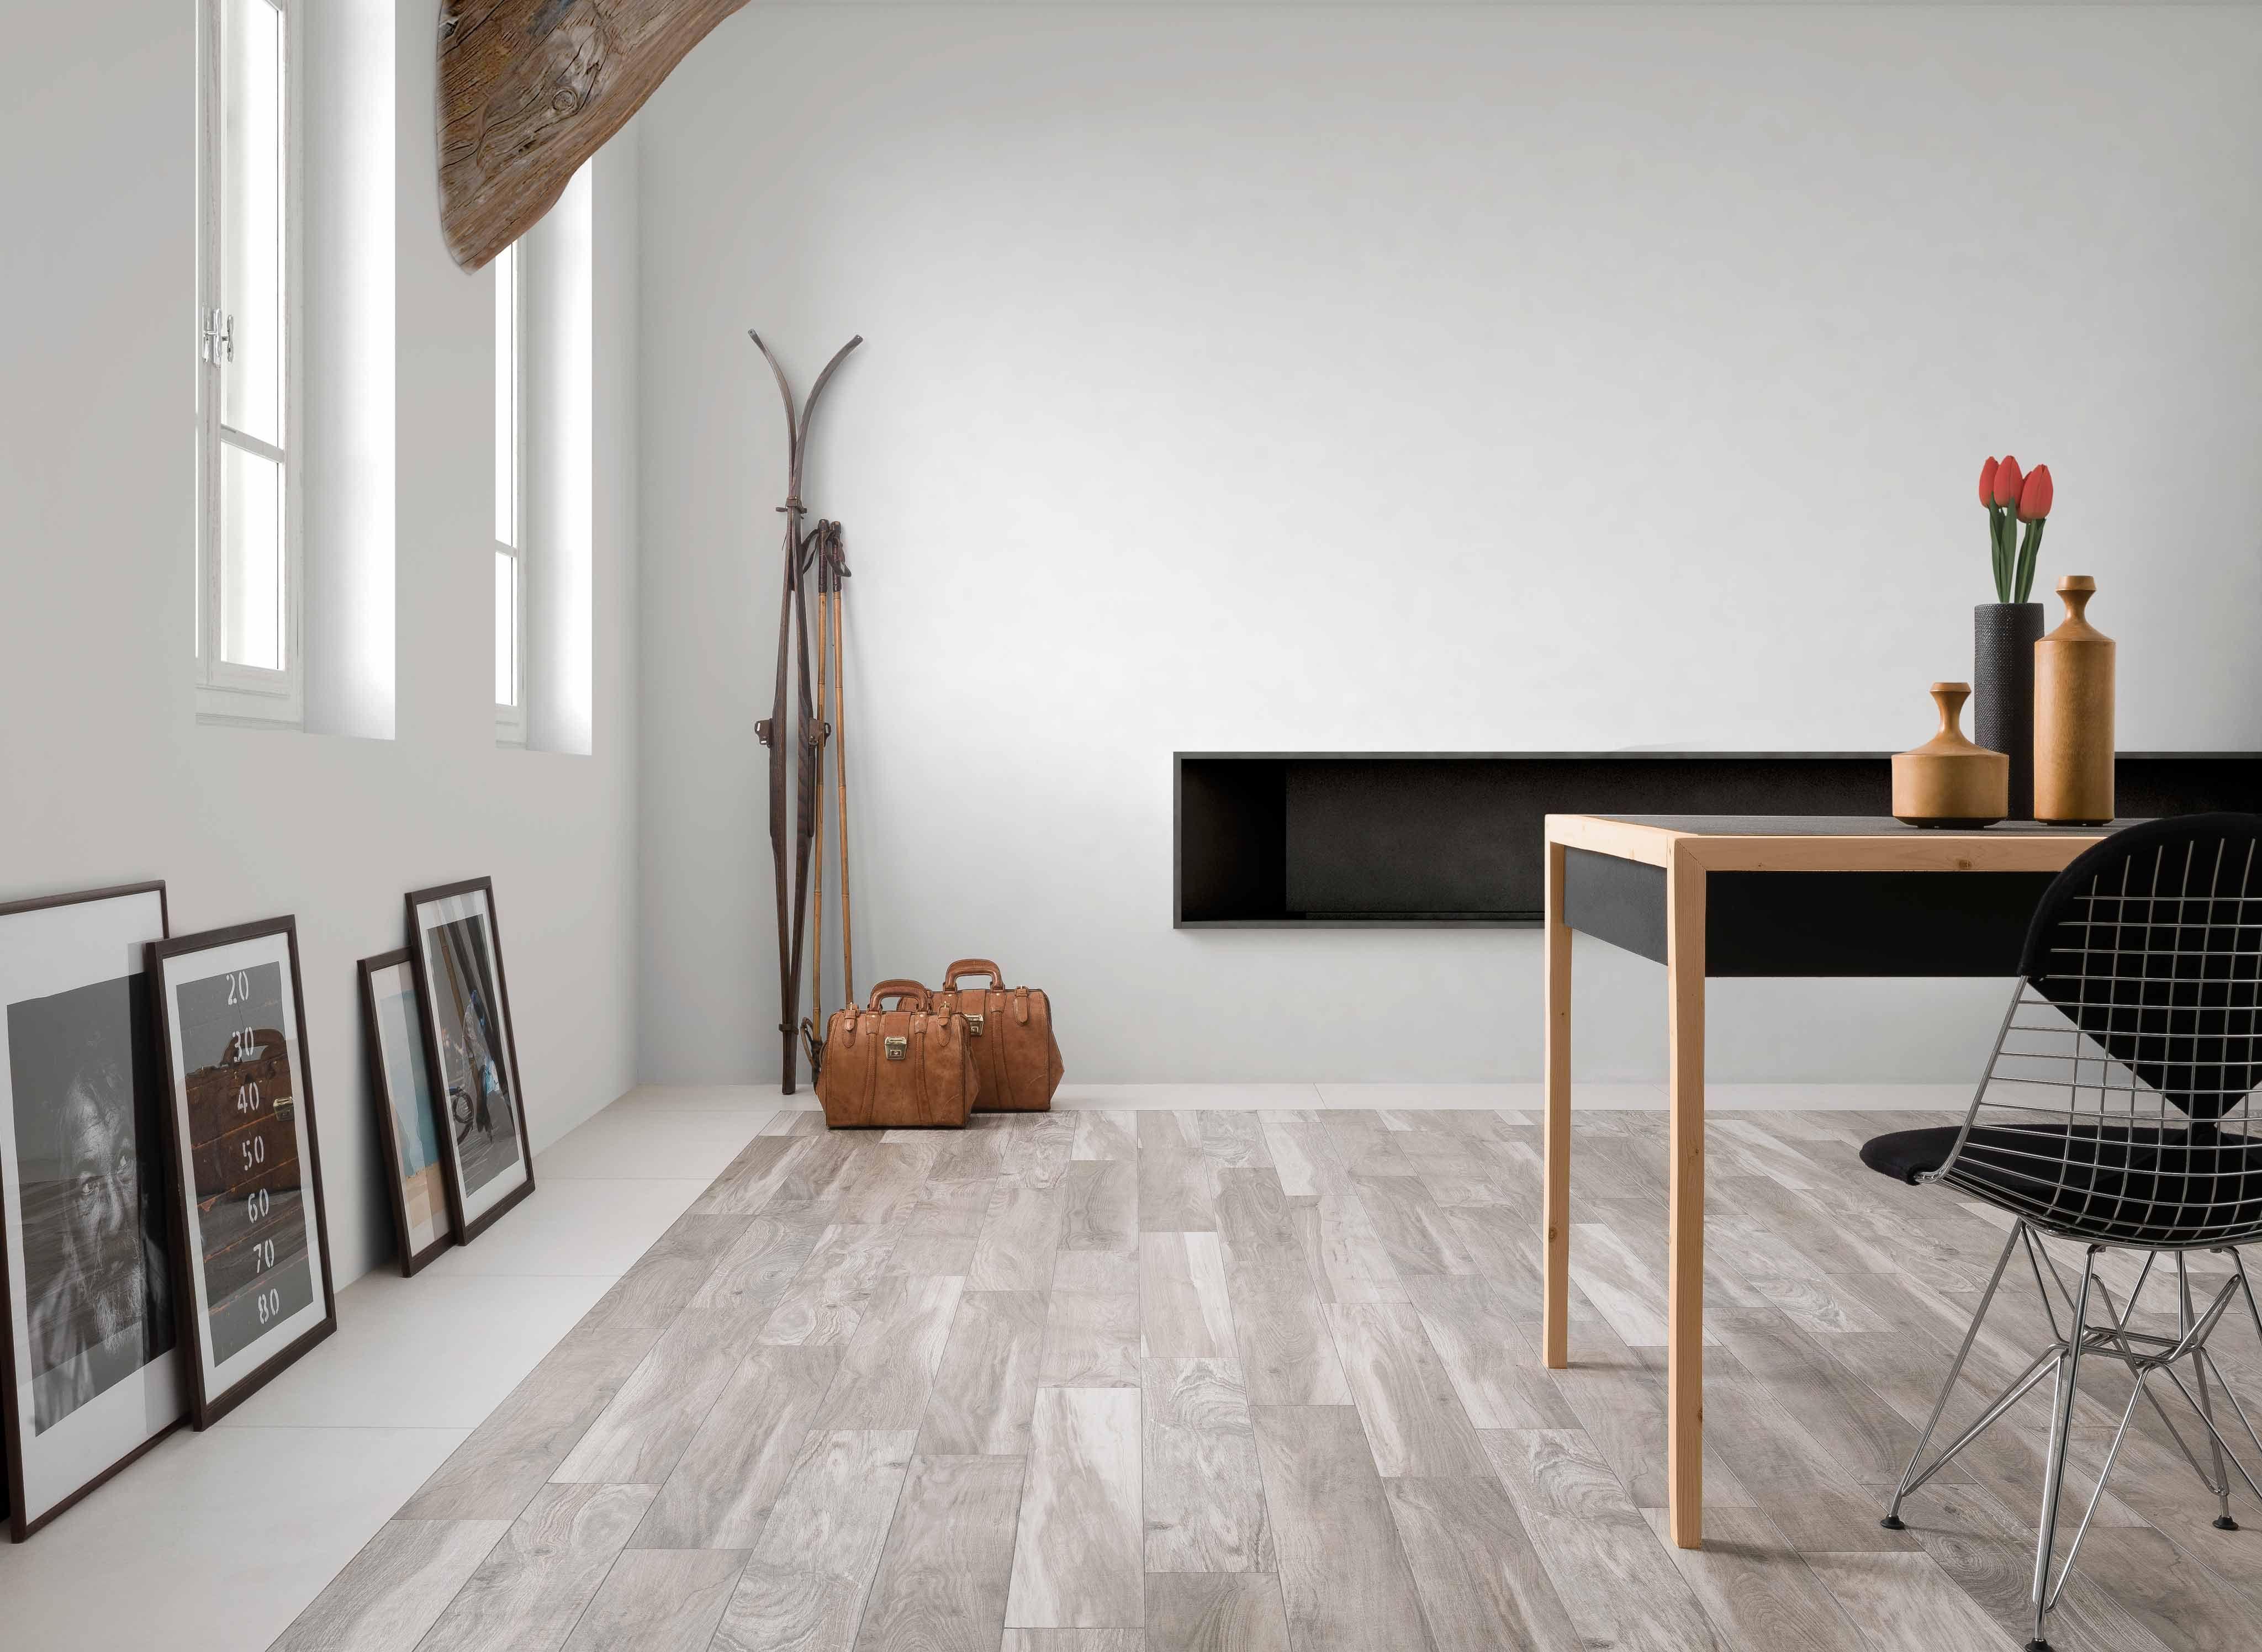 Vogue Gres Porcellanato Creative Tile Tile Showroom Home Decor